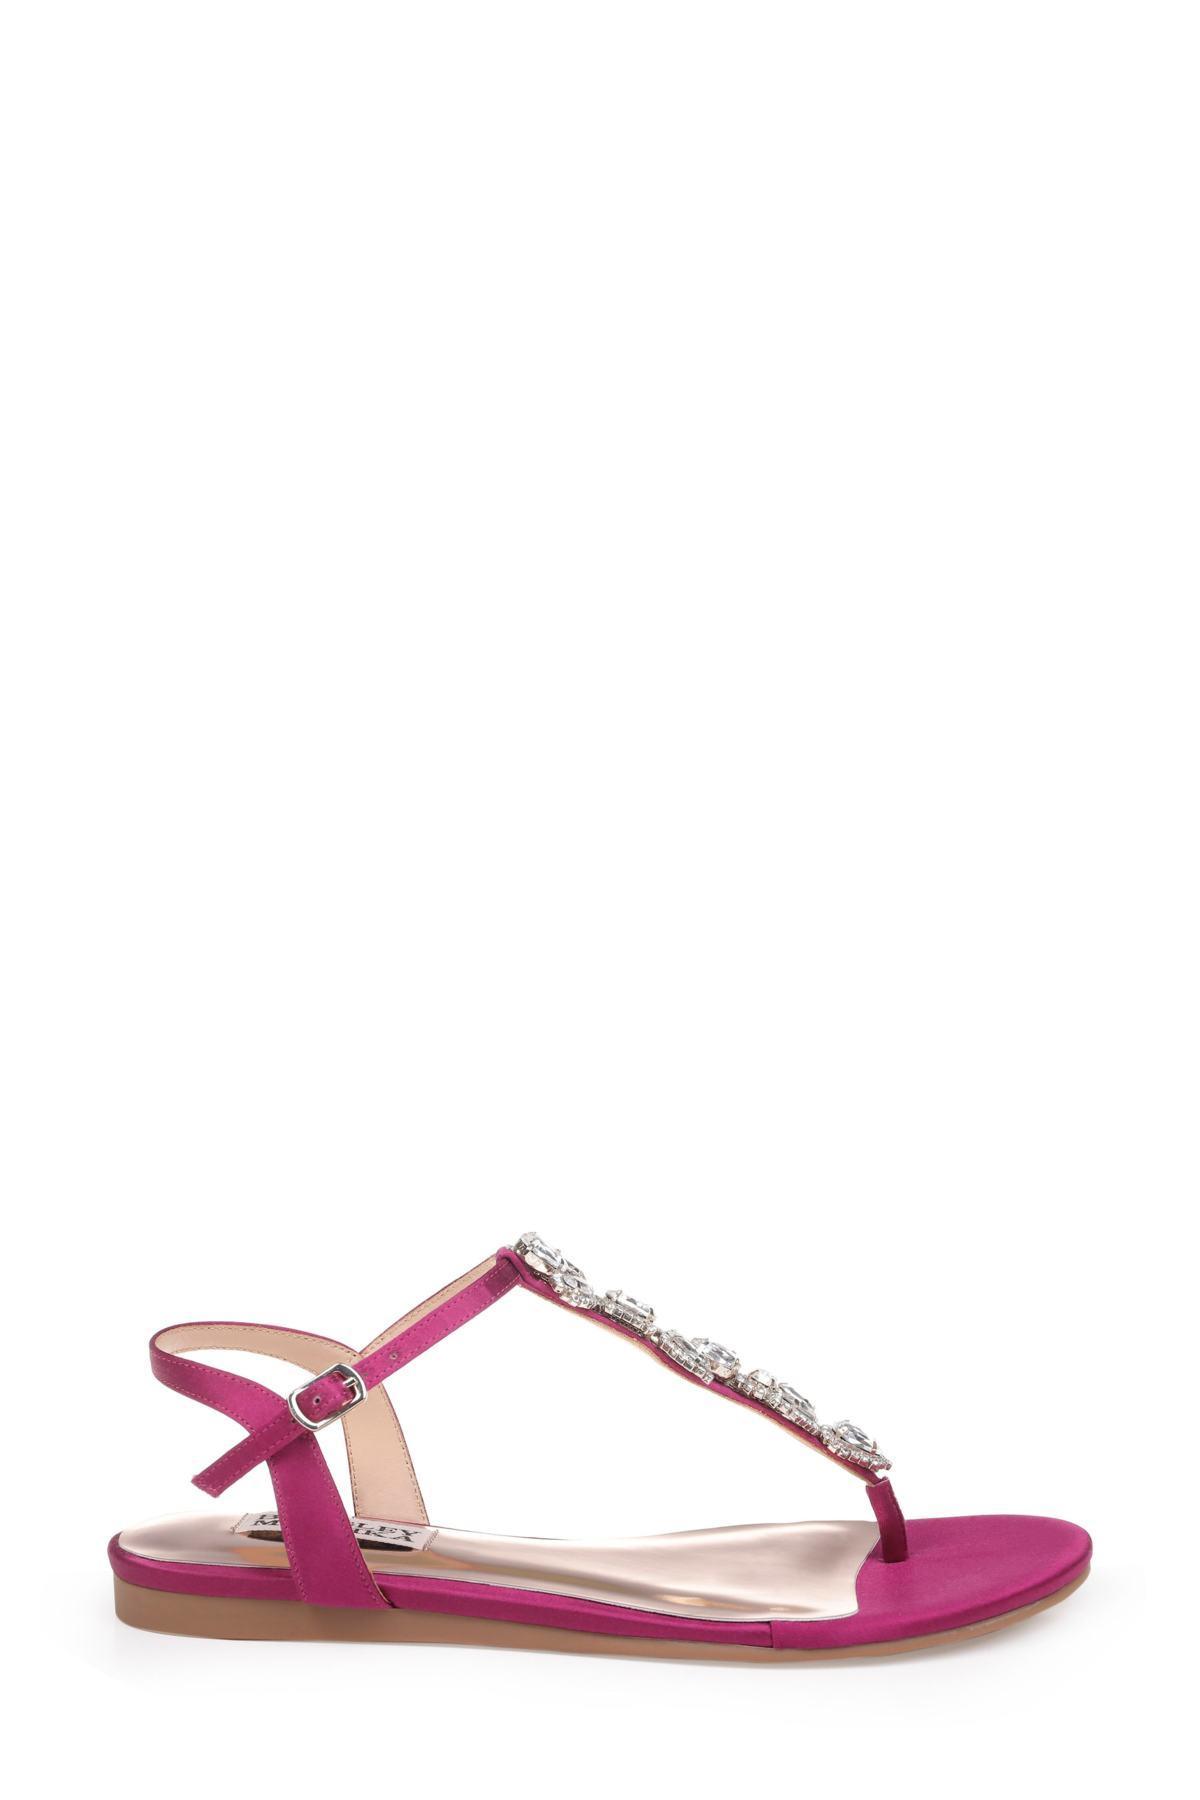 4b7374b8fe2 Badgley Mischka - Pink Sissi Crystal Embellished Sandal - Lyst. View  fullscreen